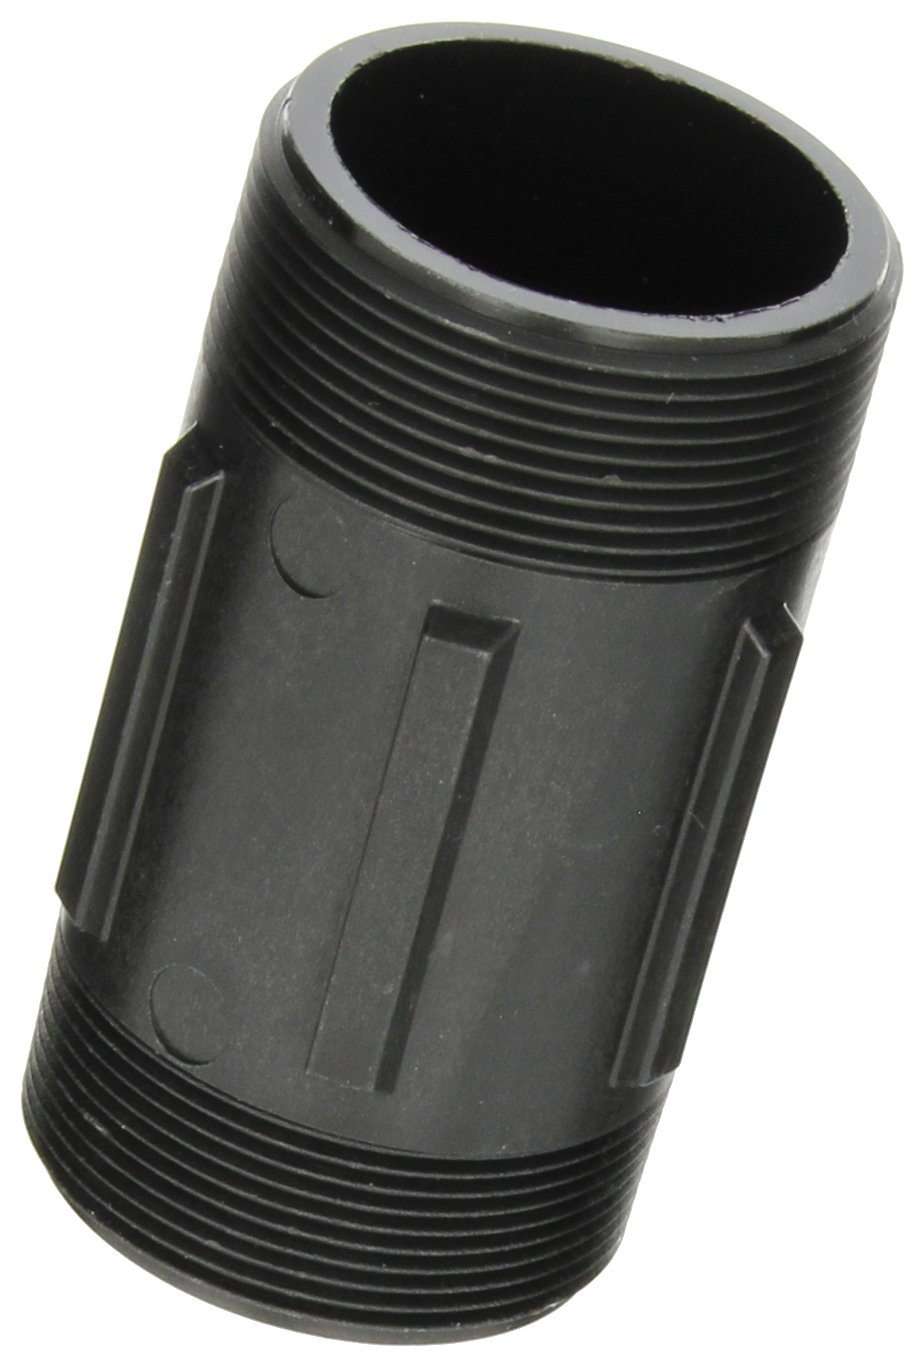 Nipple Banjo NIP200-4 Polypropylene Pipe Fitting Schedule 80 2 NPT Male x 4 Length